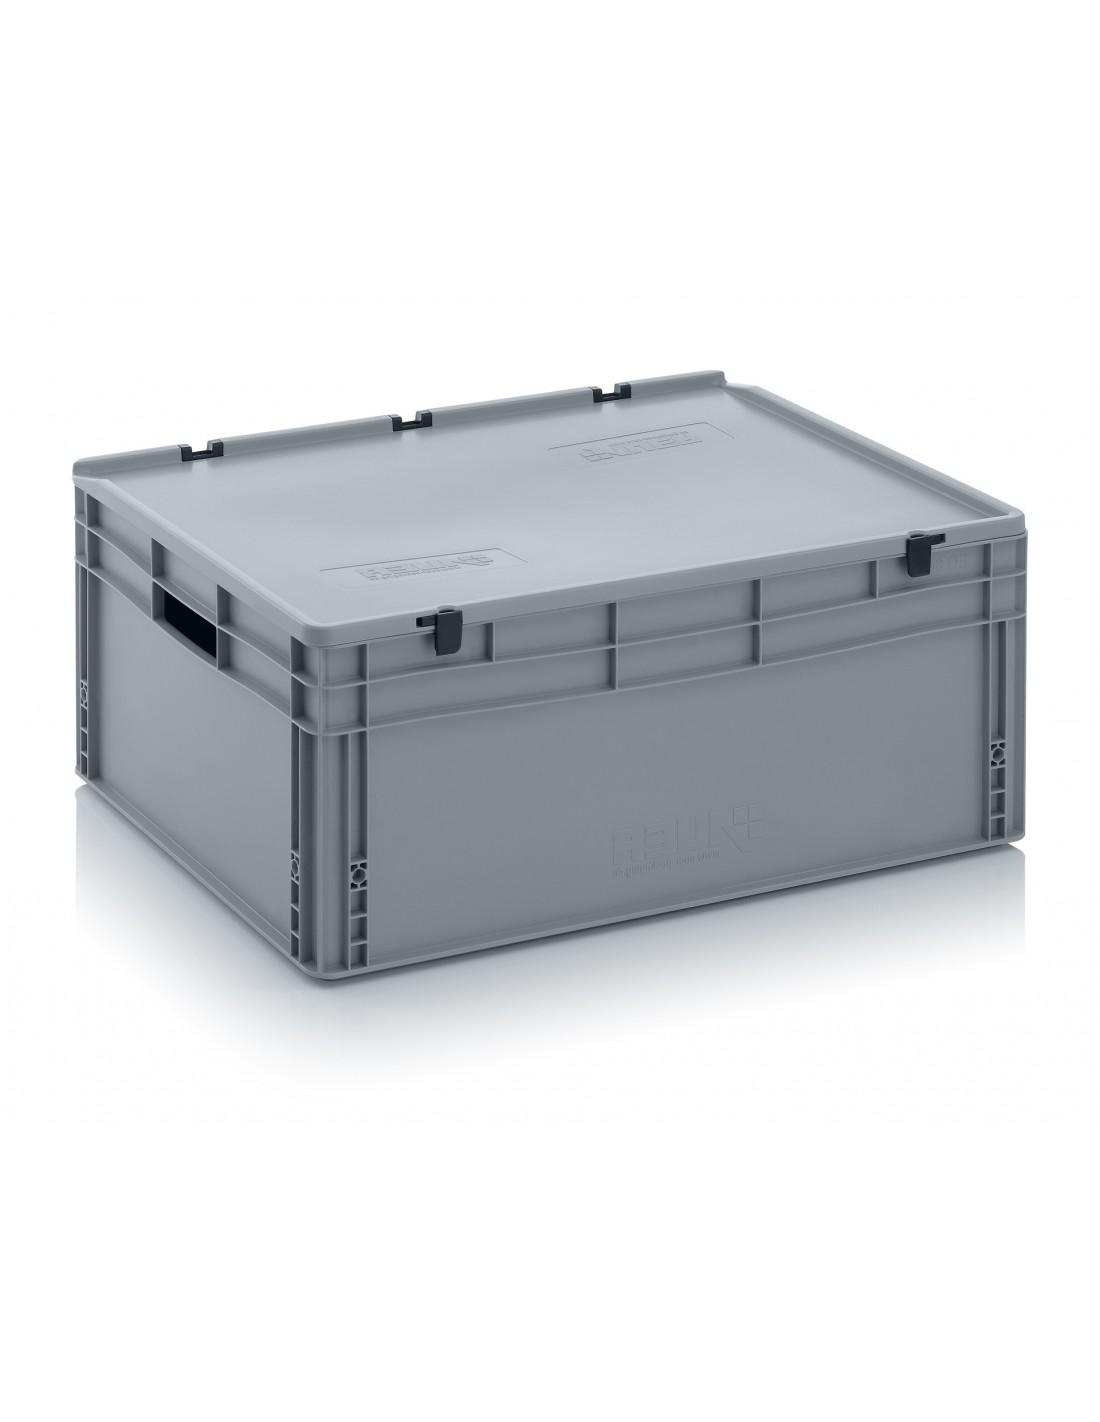 800 x 600 x 320 mm Eurobehälter Scharnierdeckel